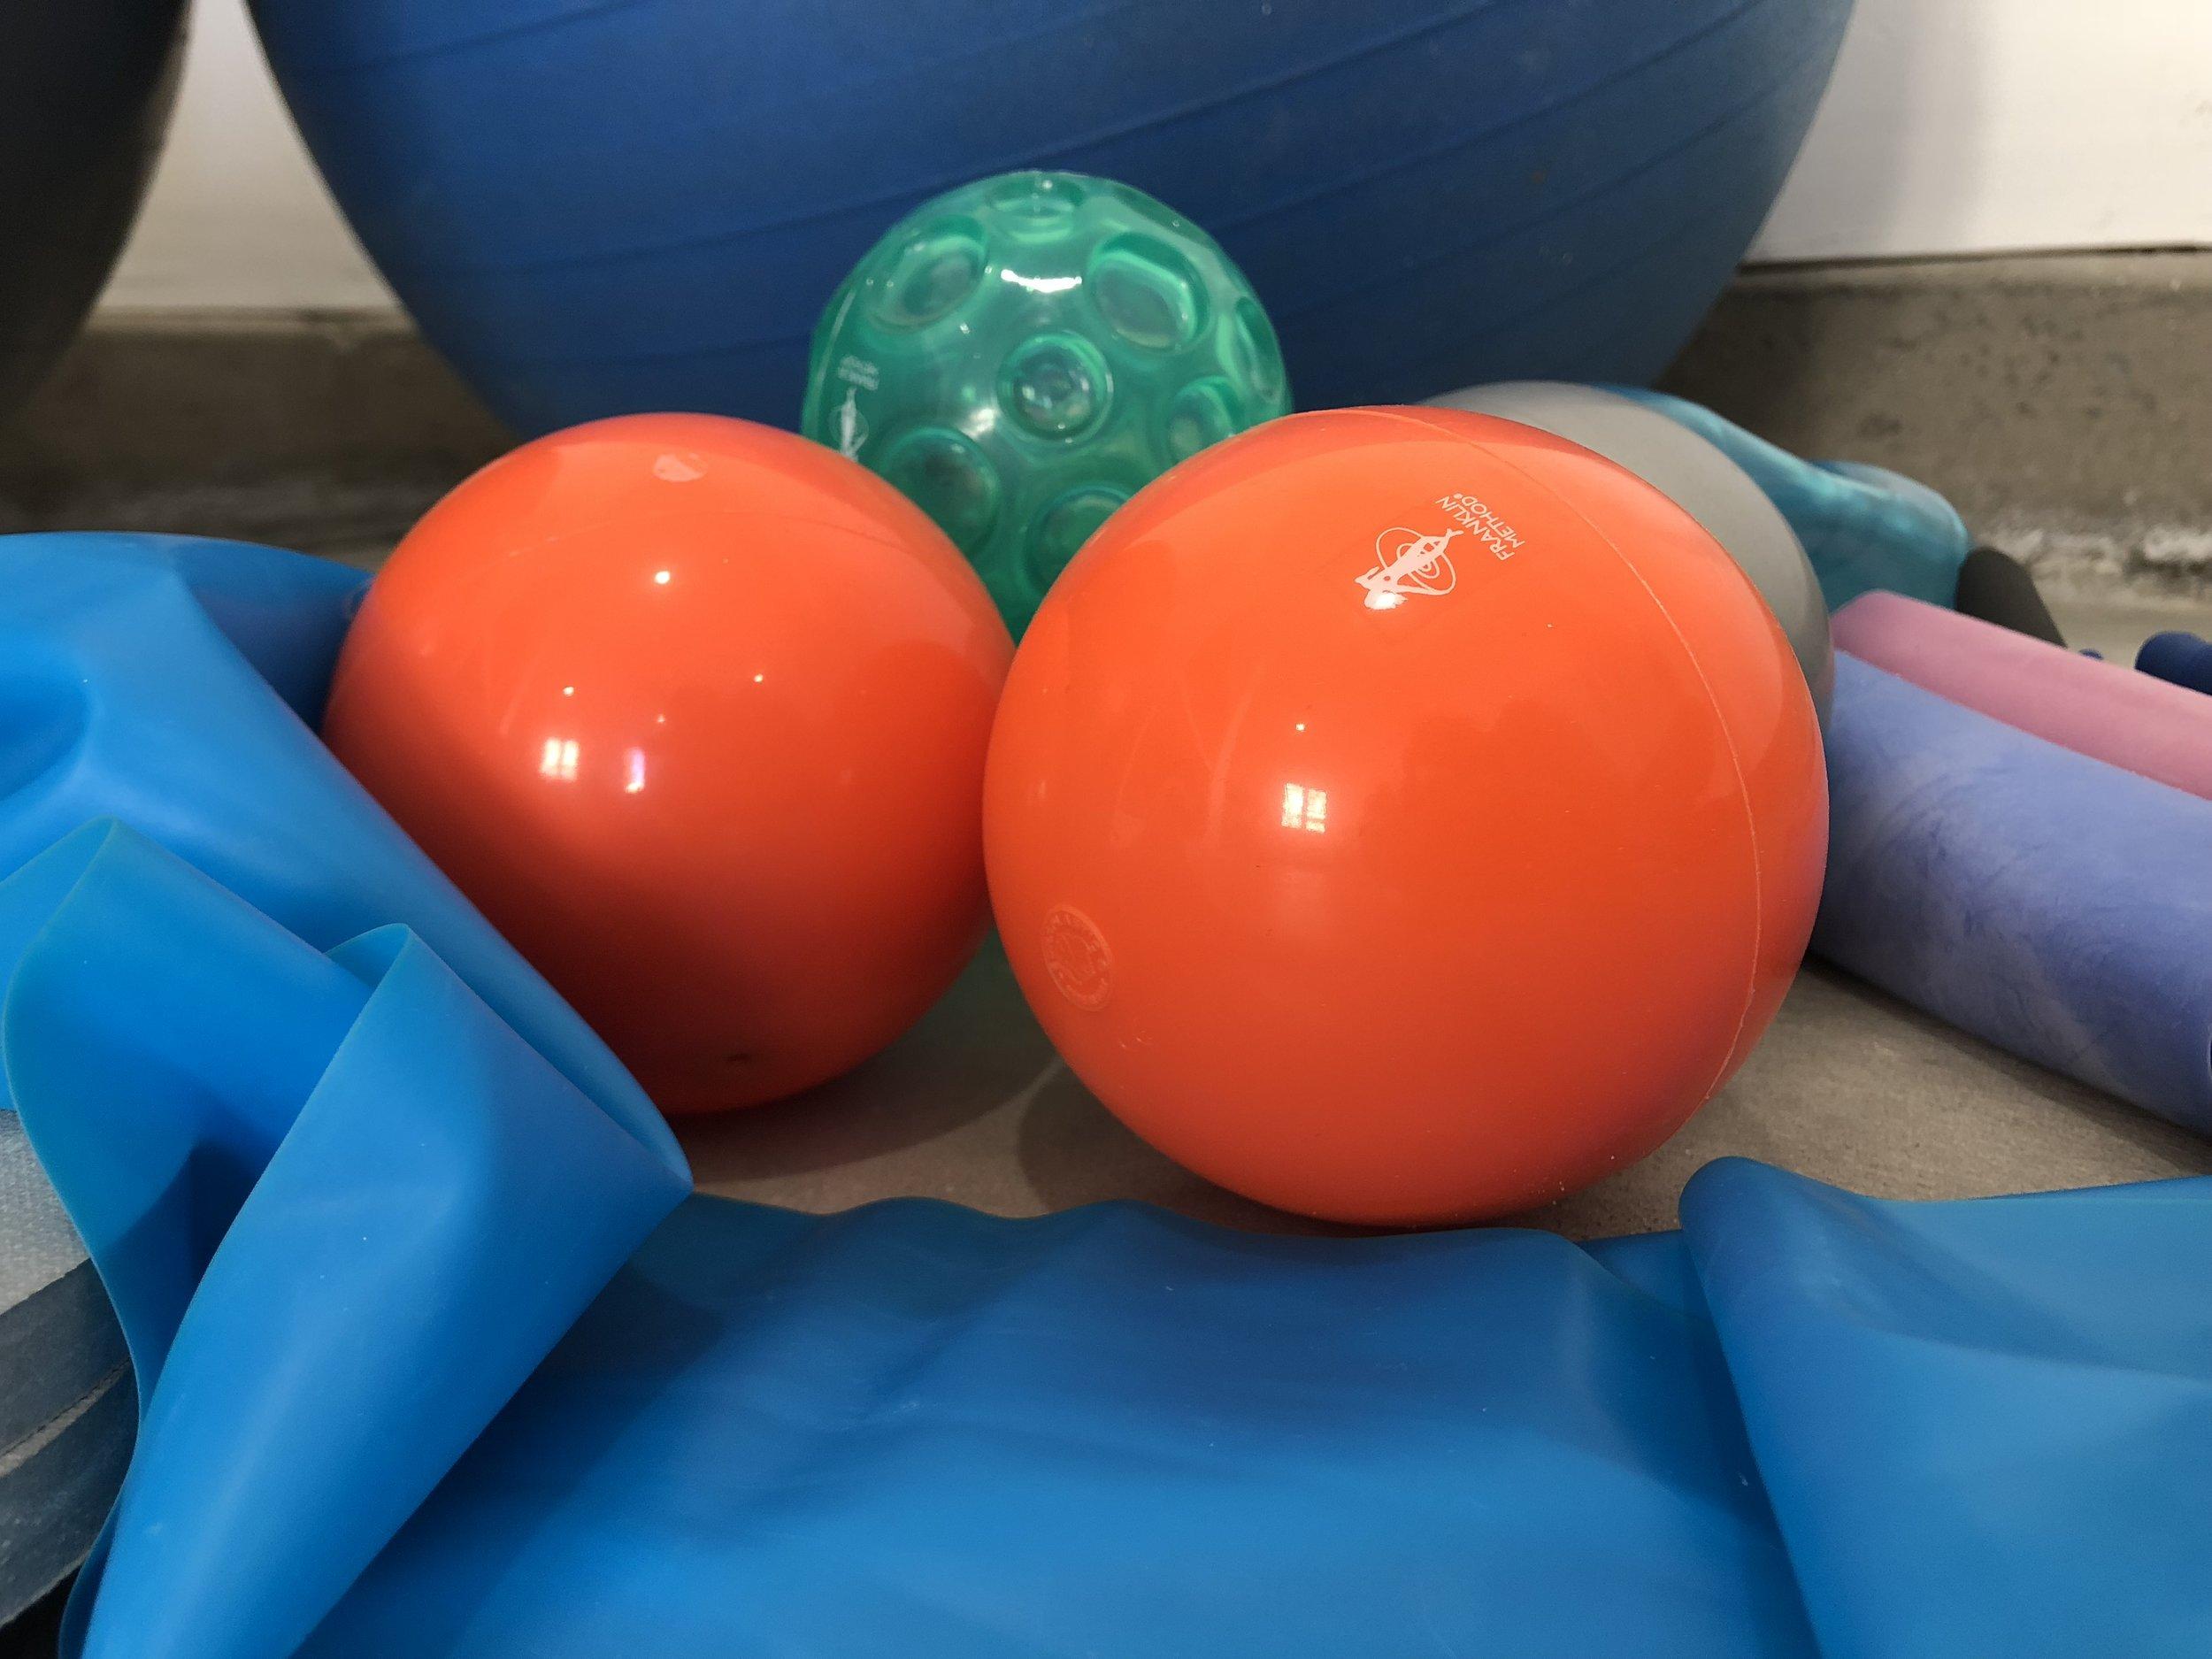 Franklin Method_Balls and Bands_Pilates Props_Apparatus.jpg